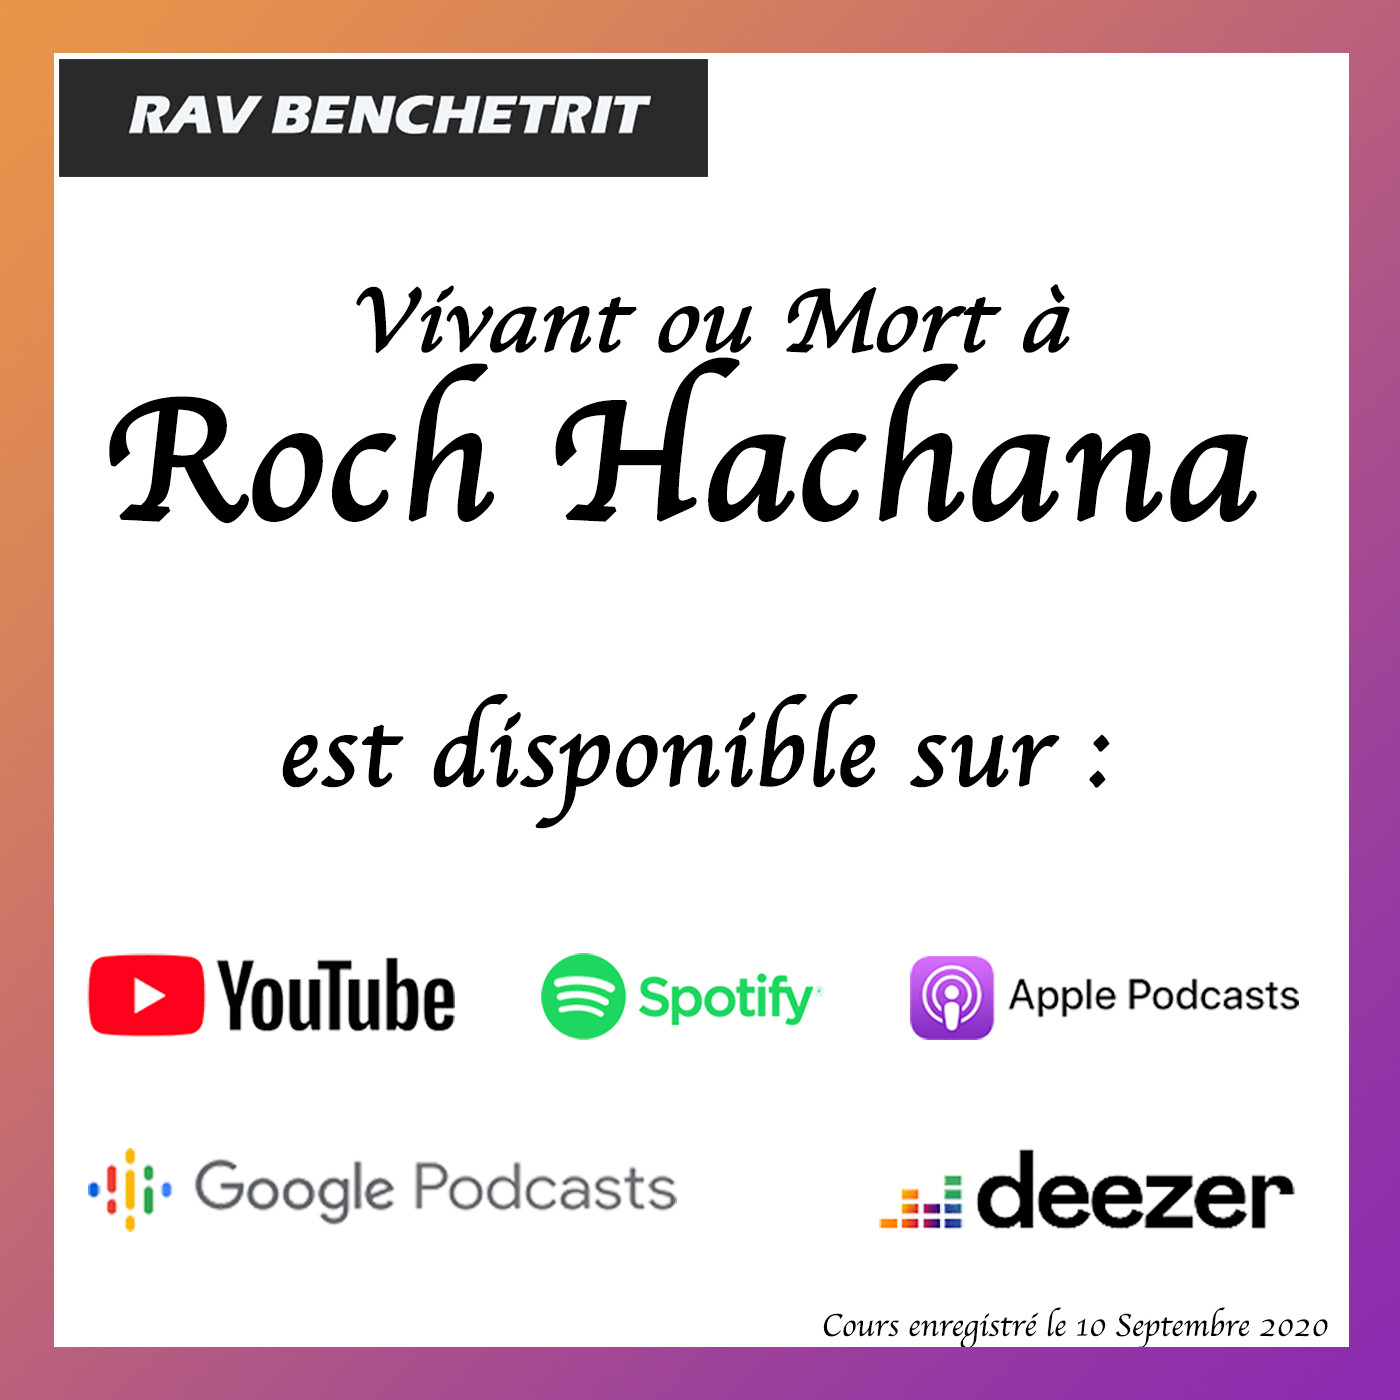 Vivant ou Mort à Roch Achana